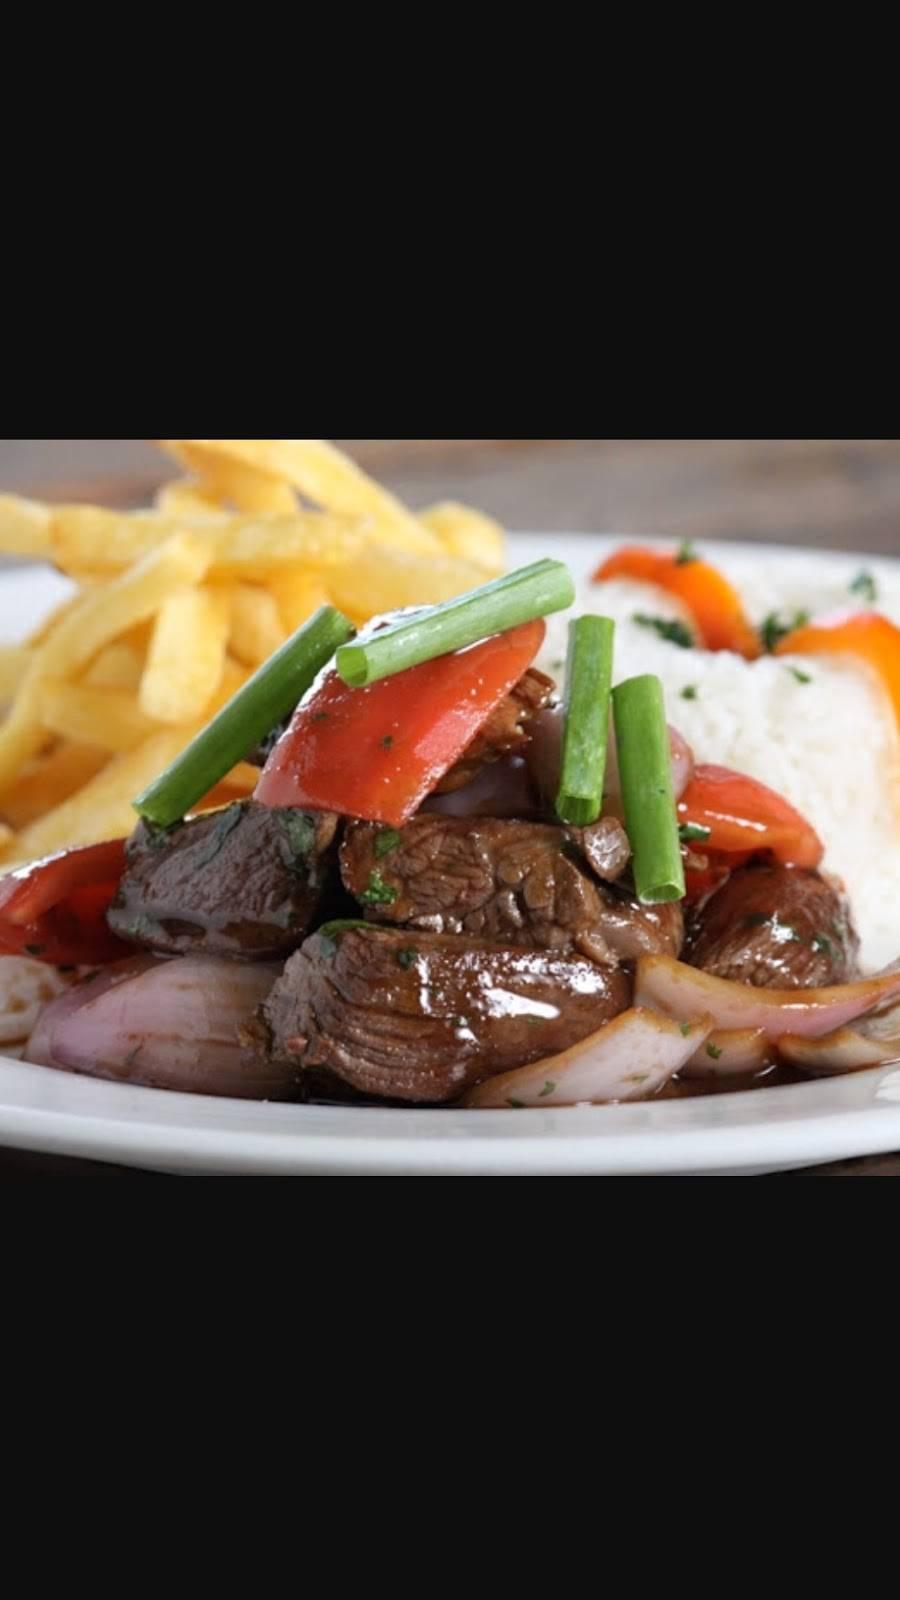 La Sabrosura | restaurant | 25 E 170th St, Bronx, NY 10452, USA | 7182937891 OR +1 718-293-7891